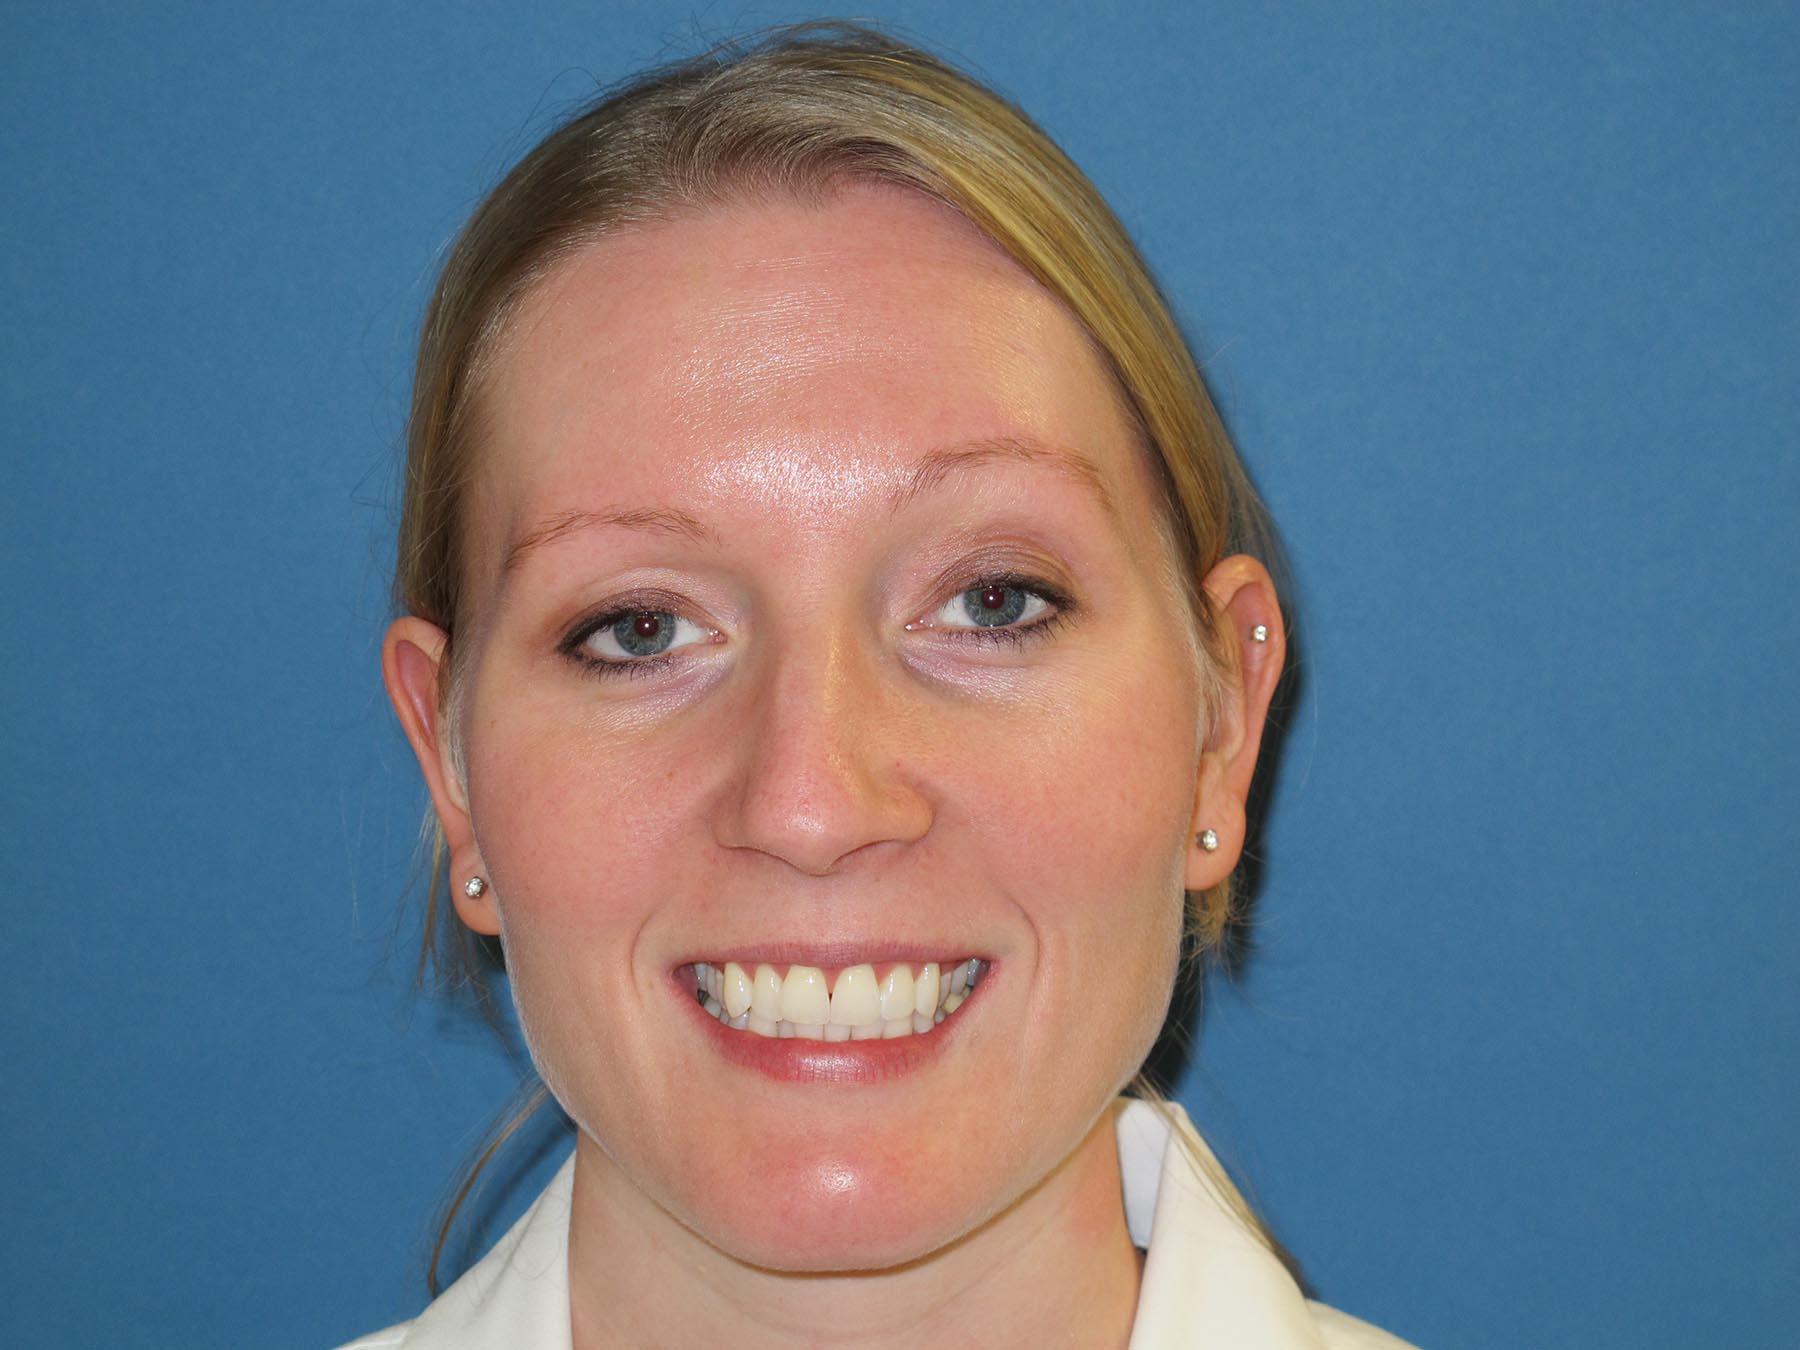 Before Aimee's Orthodontic Dental Work at Montgomery Dental Care in Woodbury, MN